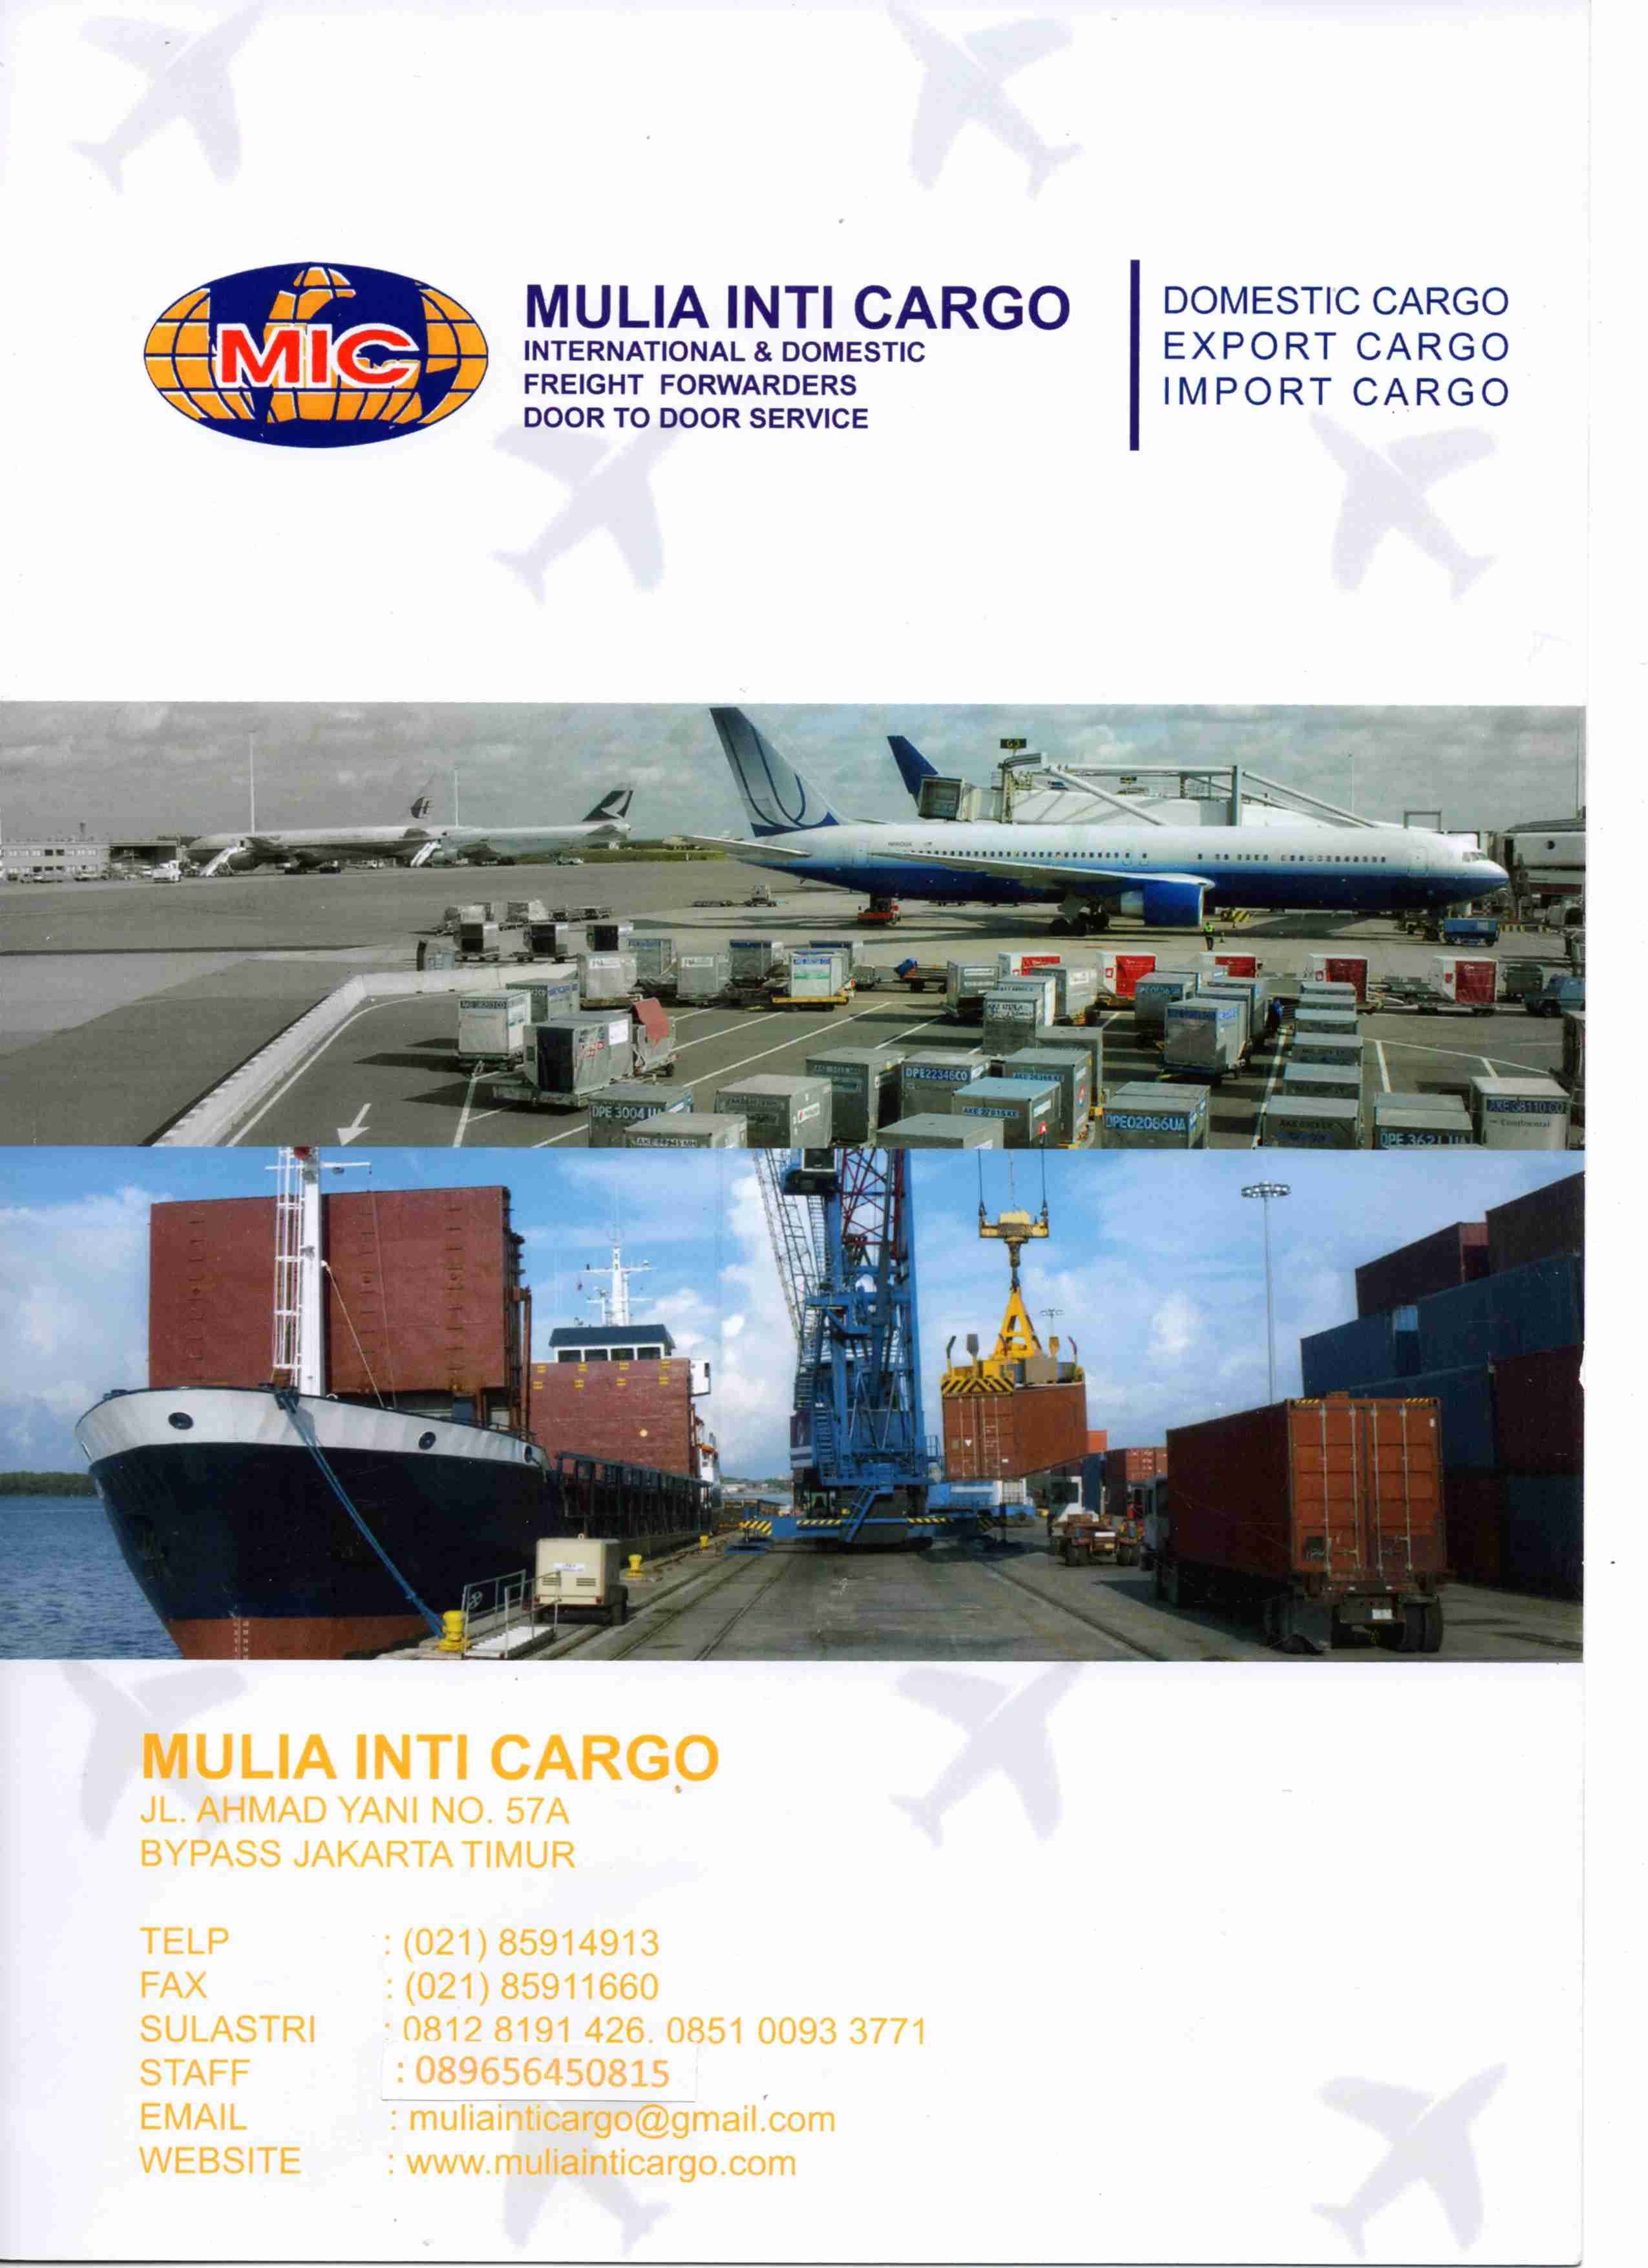 Foto: Jasa Kargo International Import & Domestik Kargo Keseluruh Indonesia